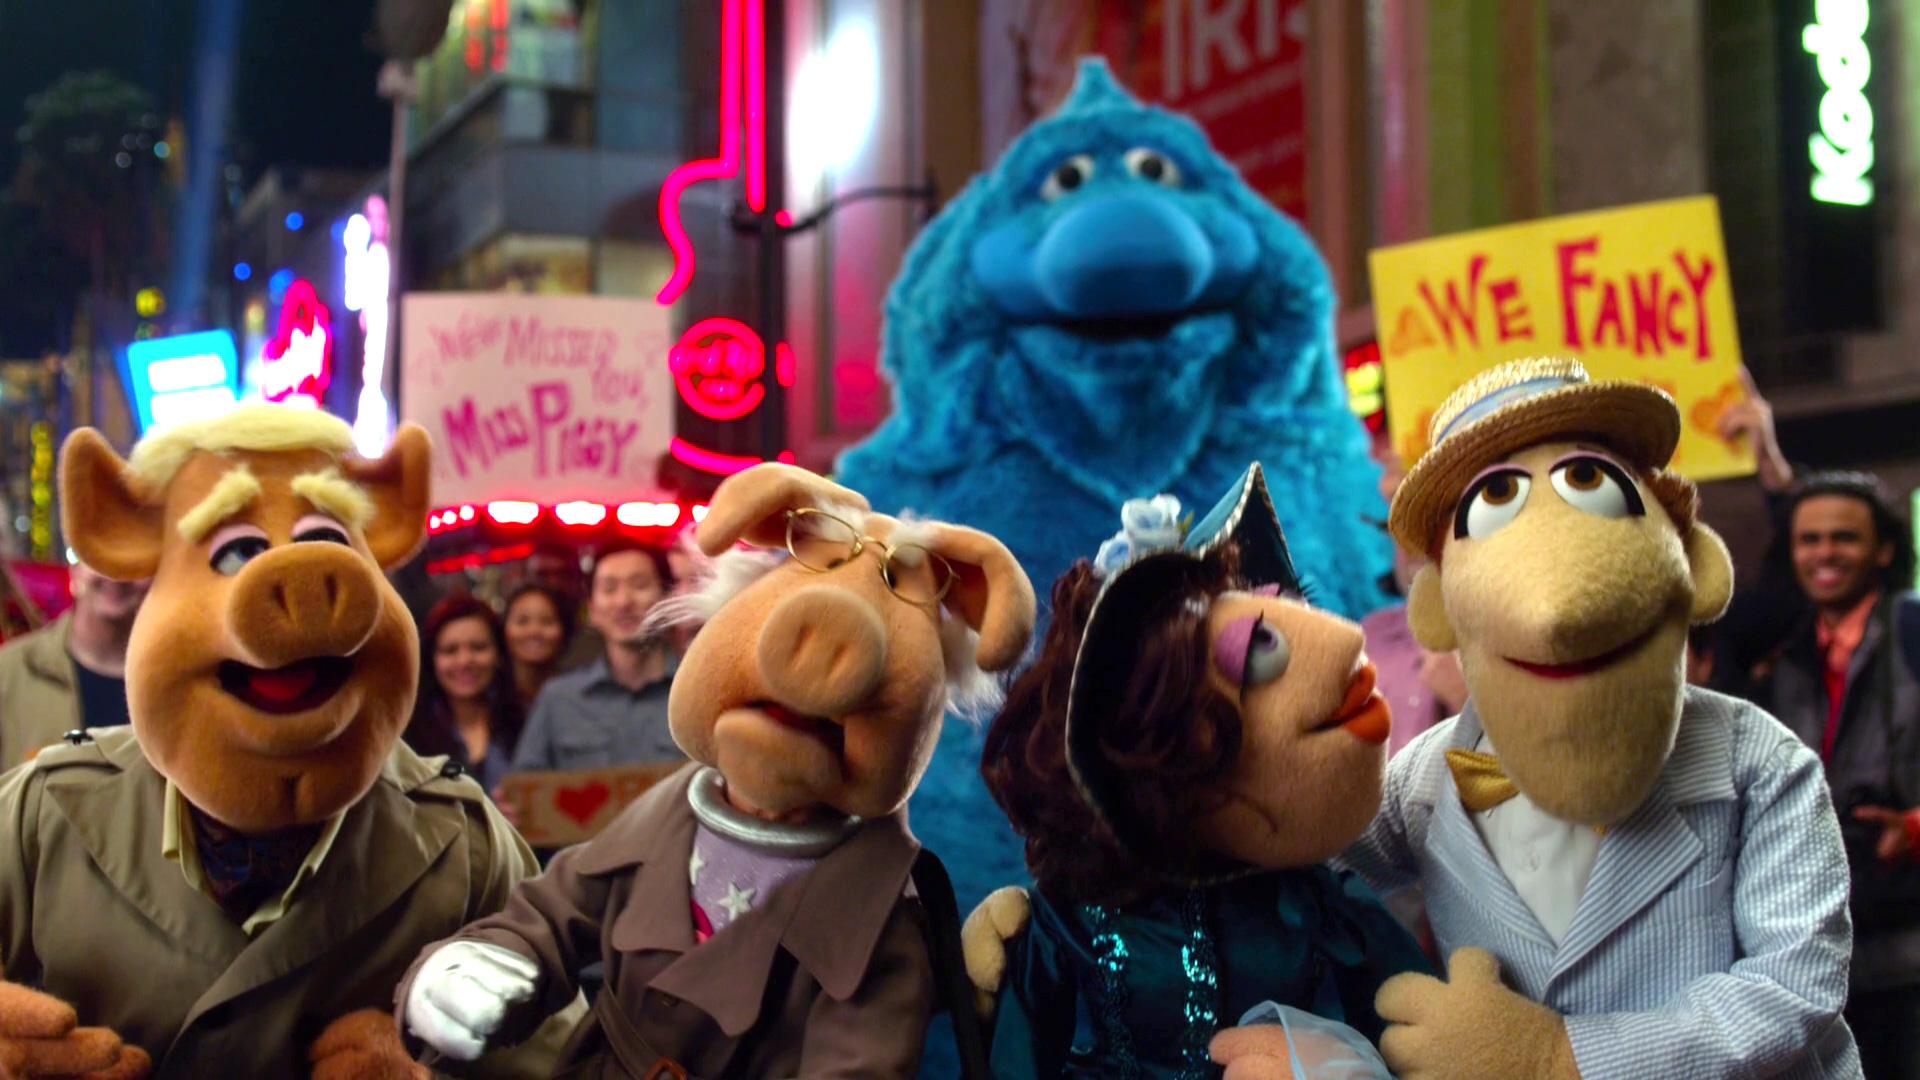 muppets 2018 movie - HD1920×1080